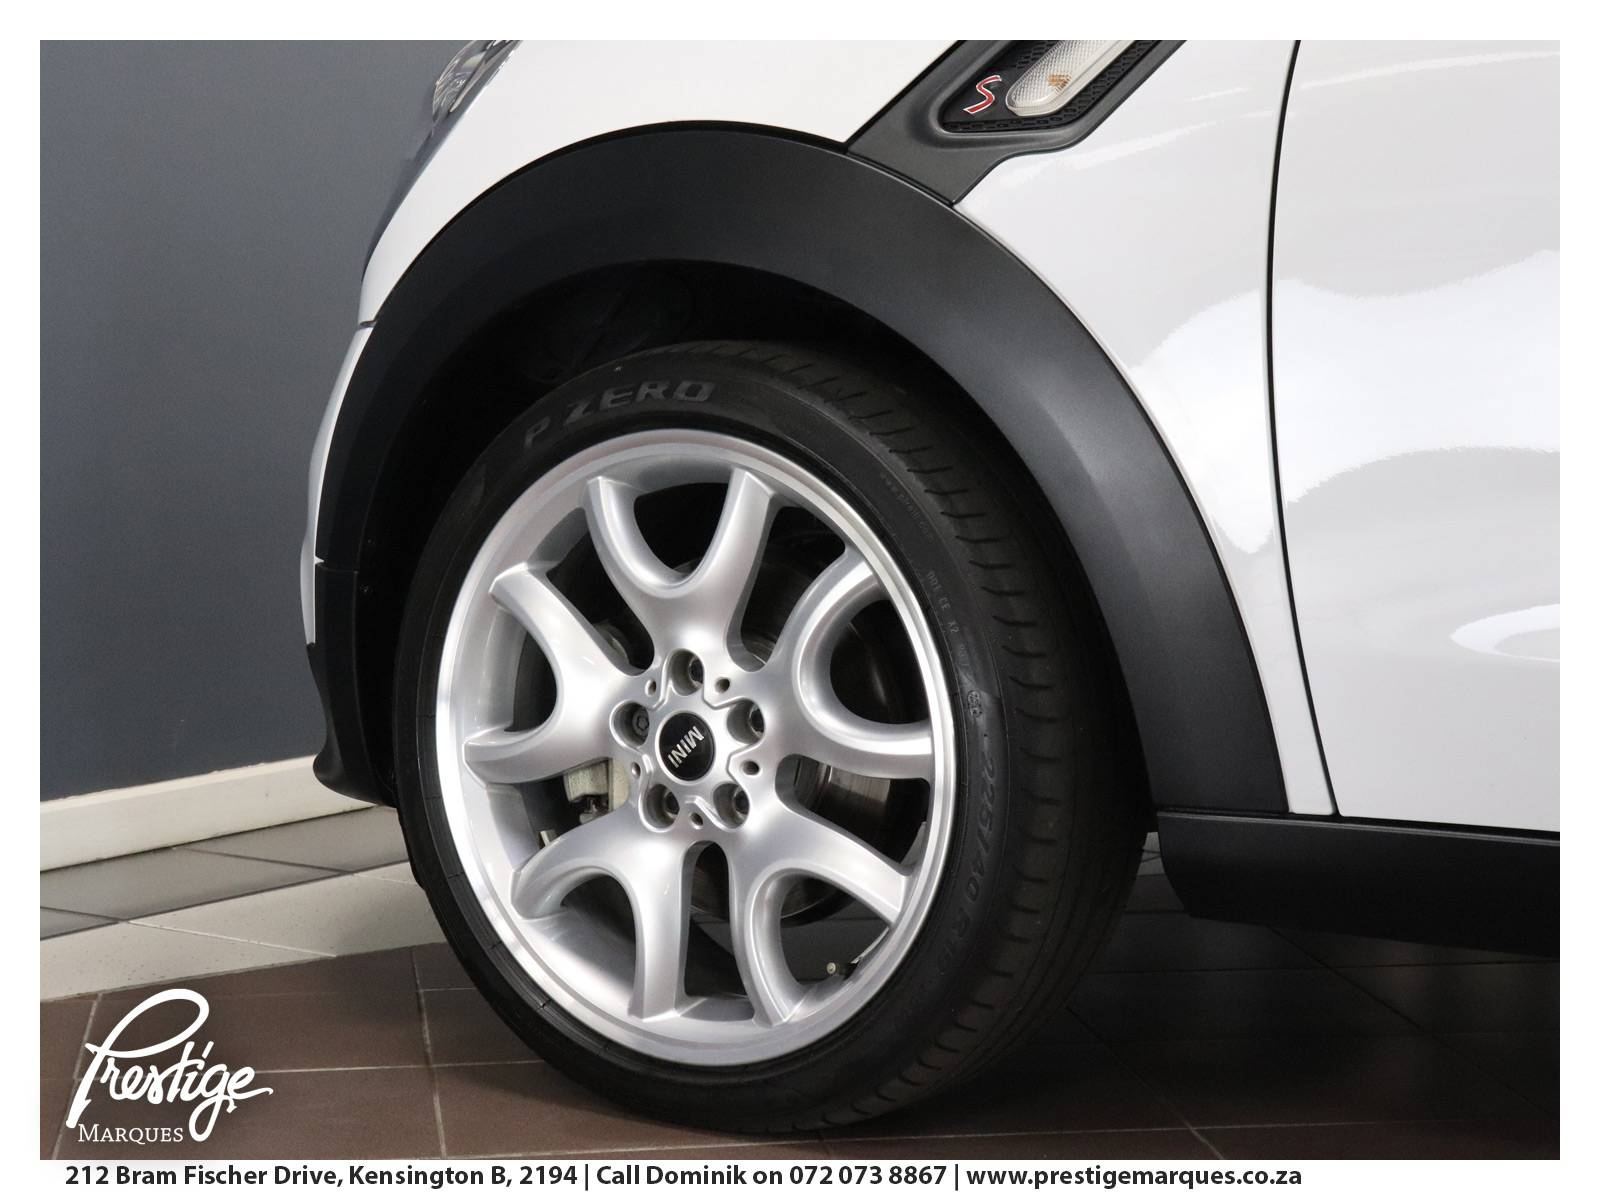 2016-MINI-cooper-s-paceman-prestige-marques-randburg-sandton-12